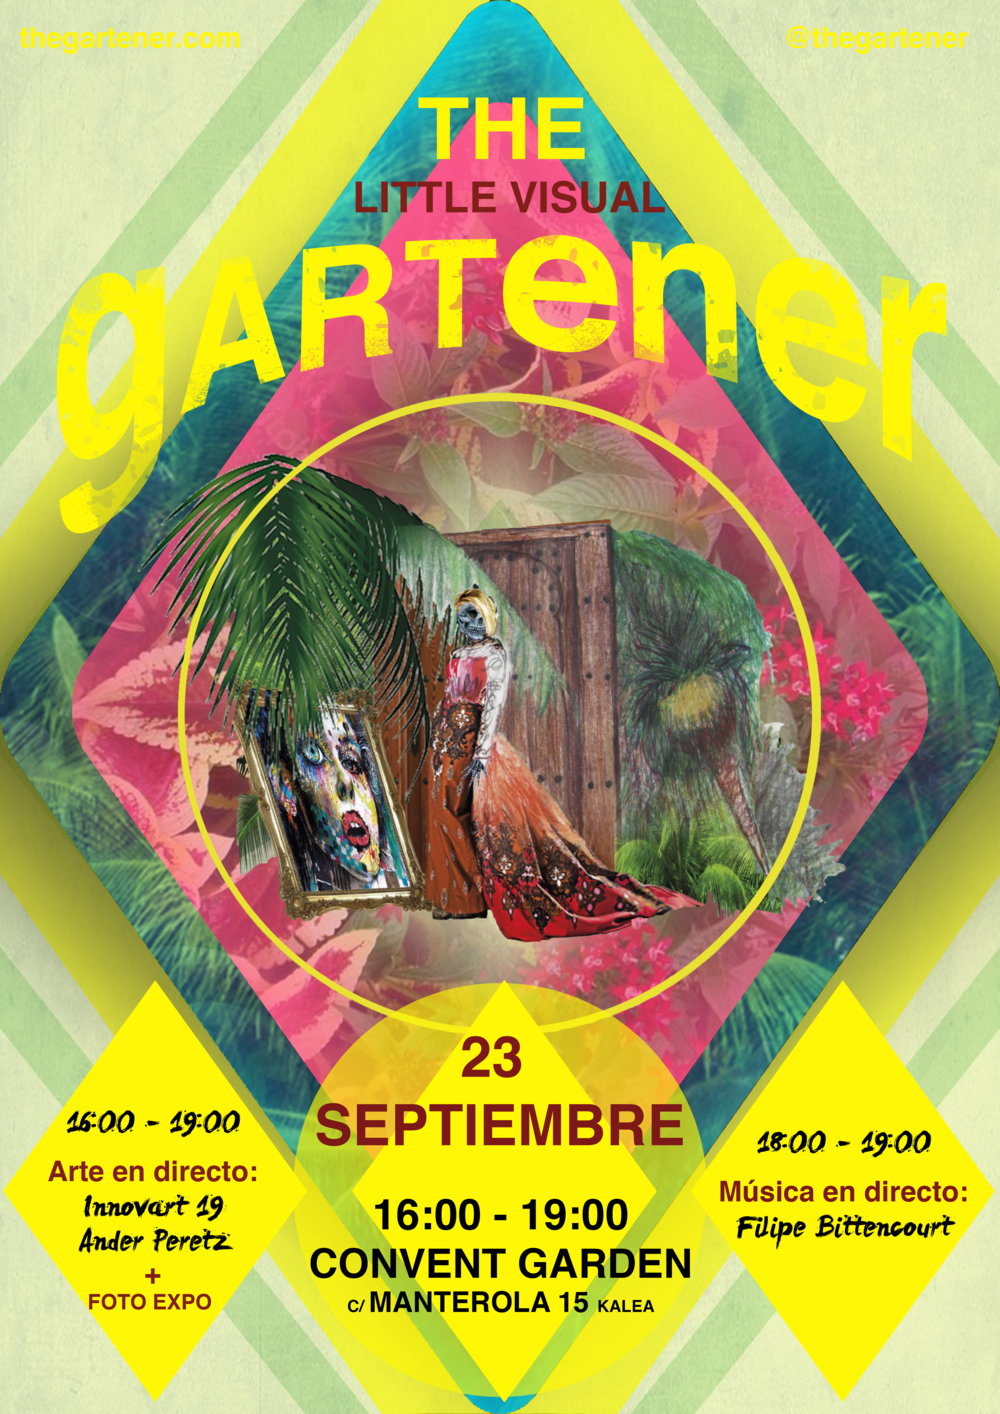 cartel.png